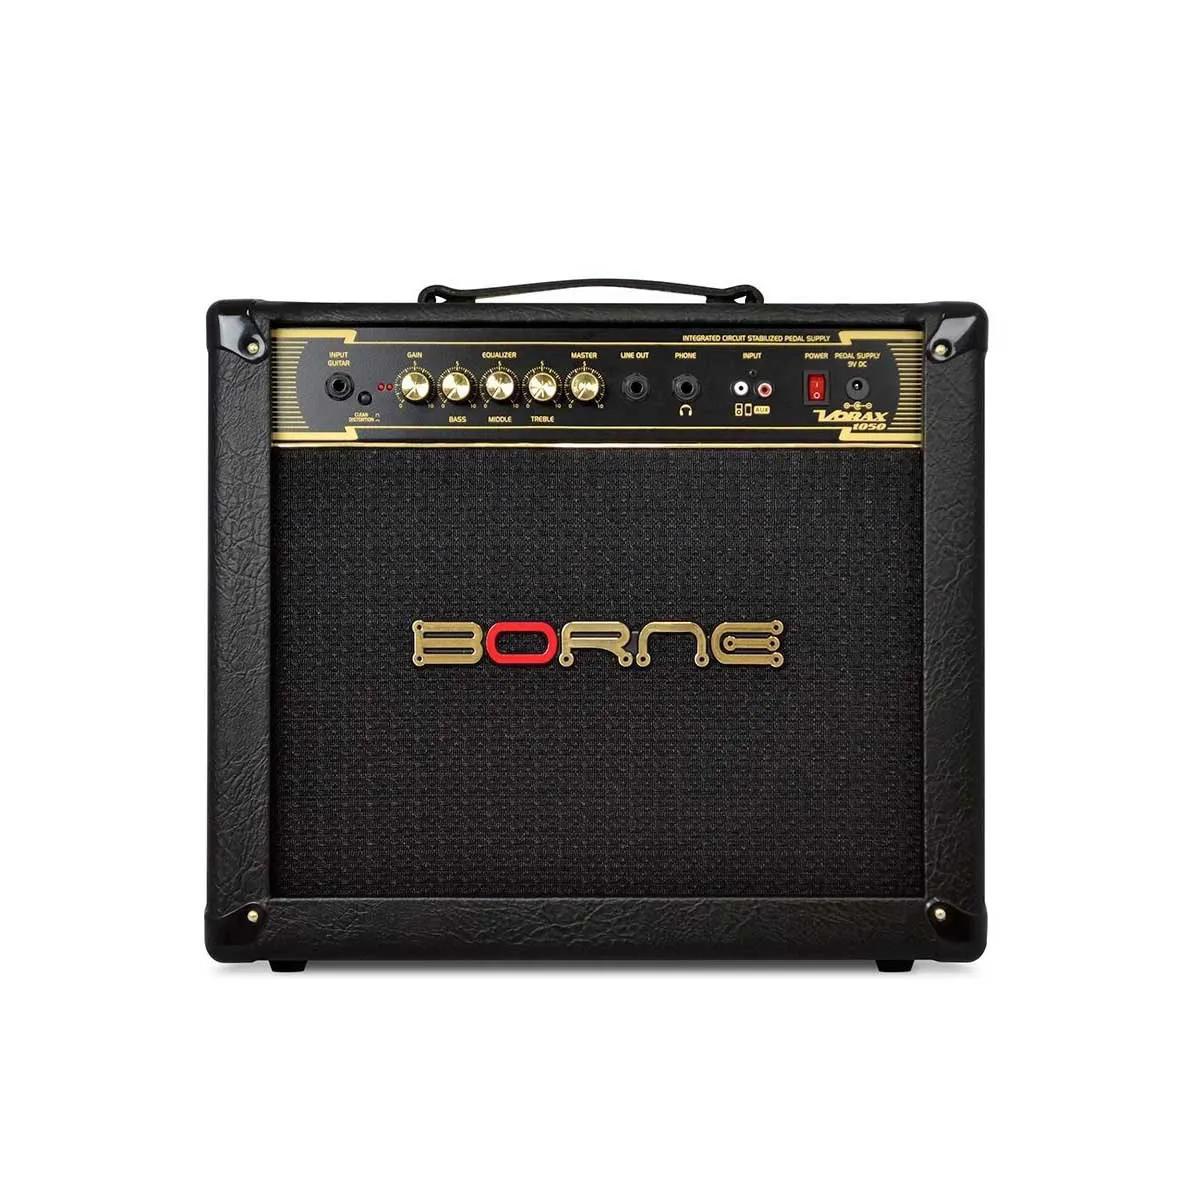 Caixa Amplificada Borne Vorax 1050 1x10 50W para Guitarra